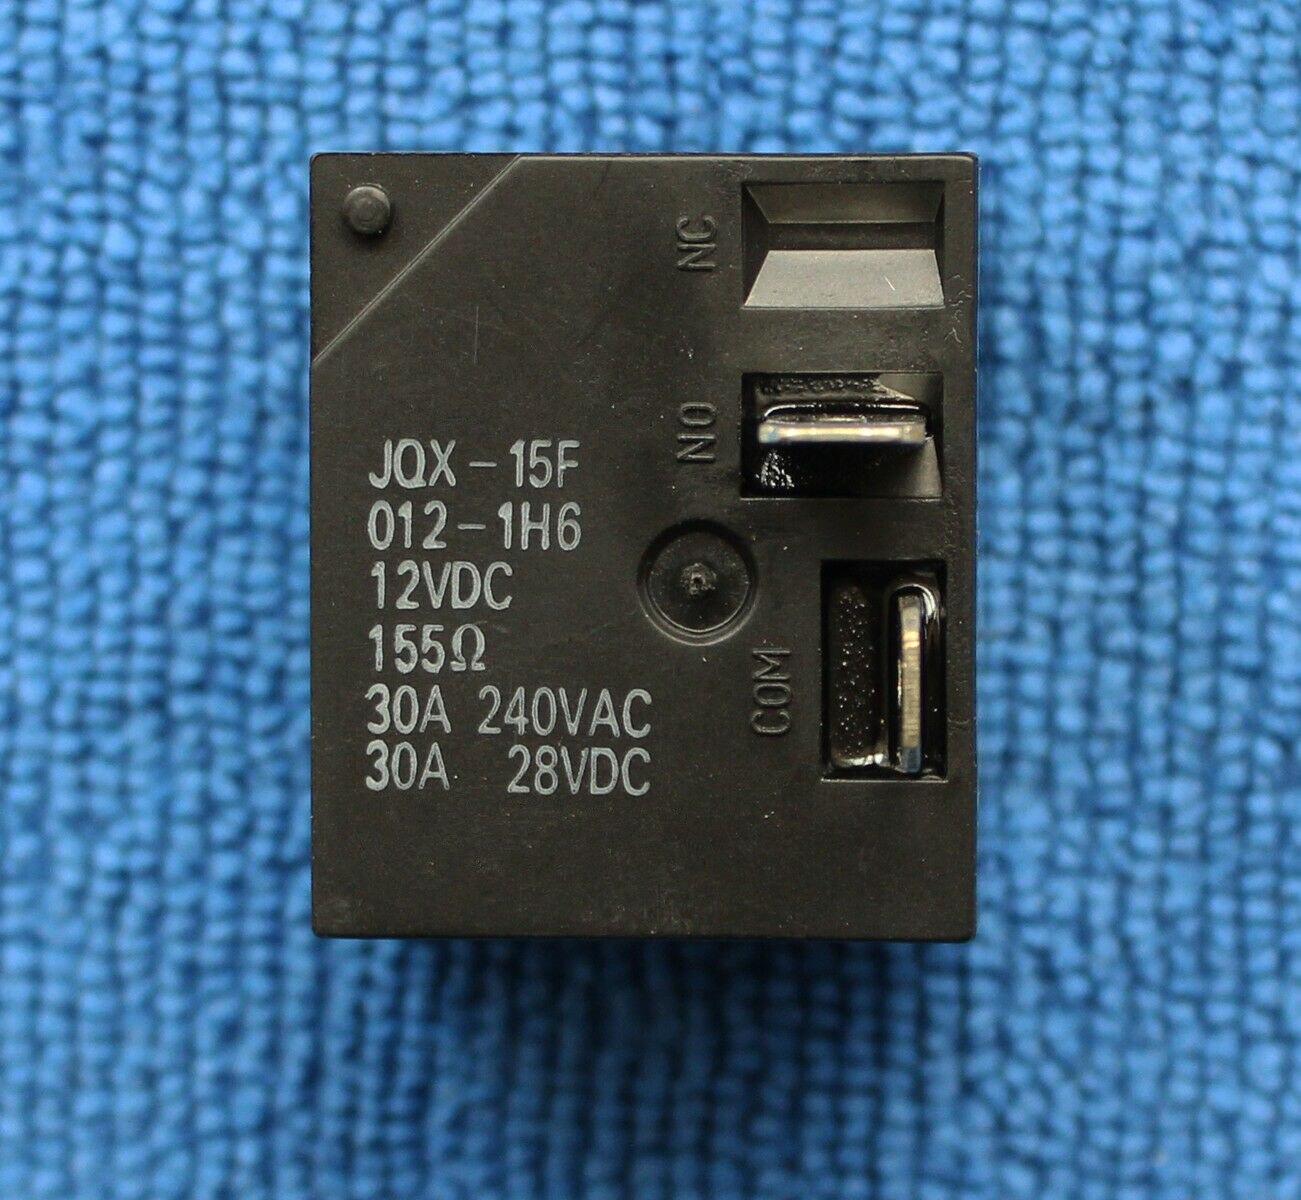 1 pcs/lot JQX-15F 012-1H6 12VDC 30A Relais 4PIN